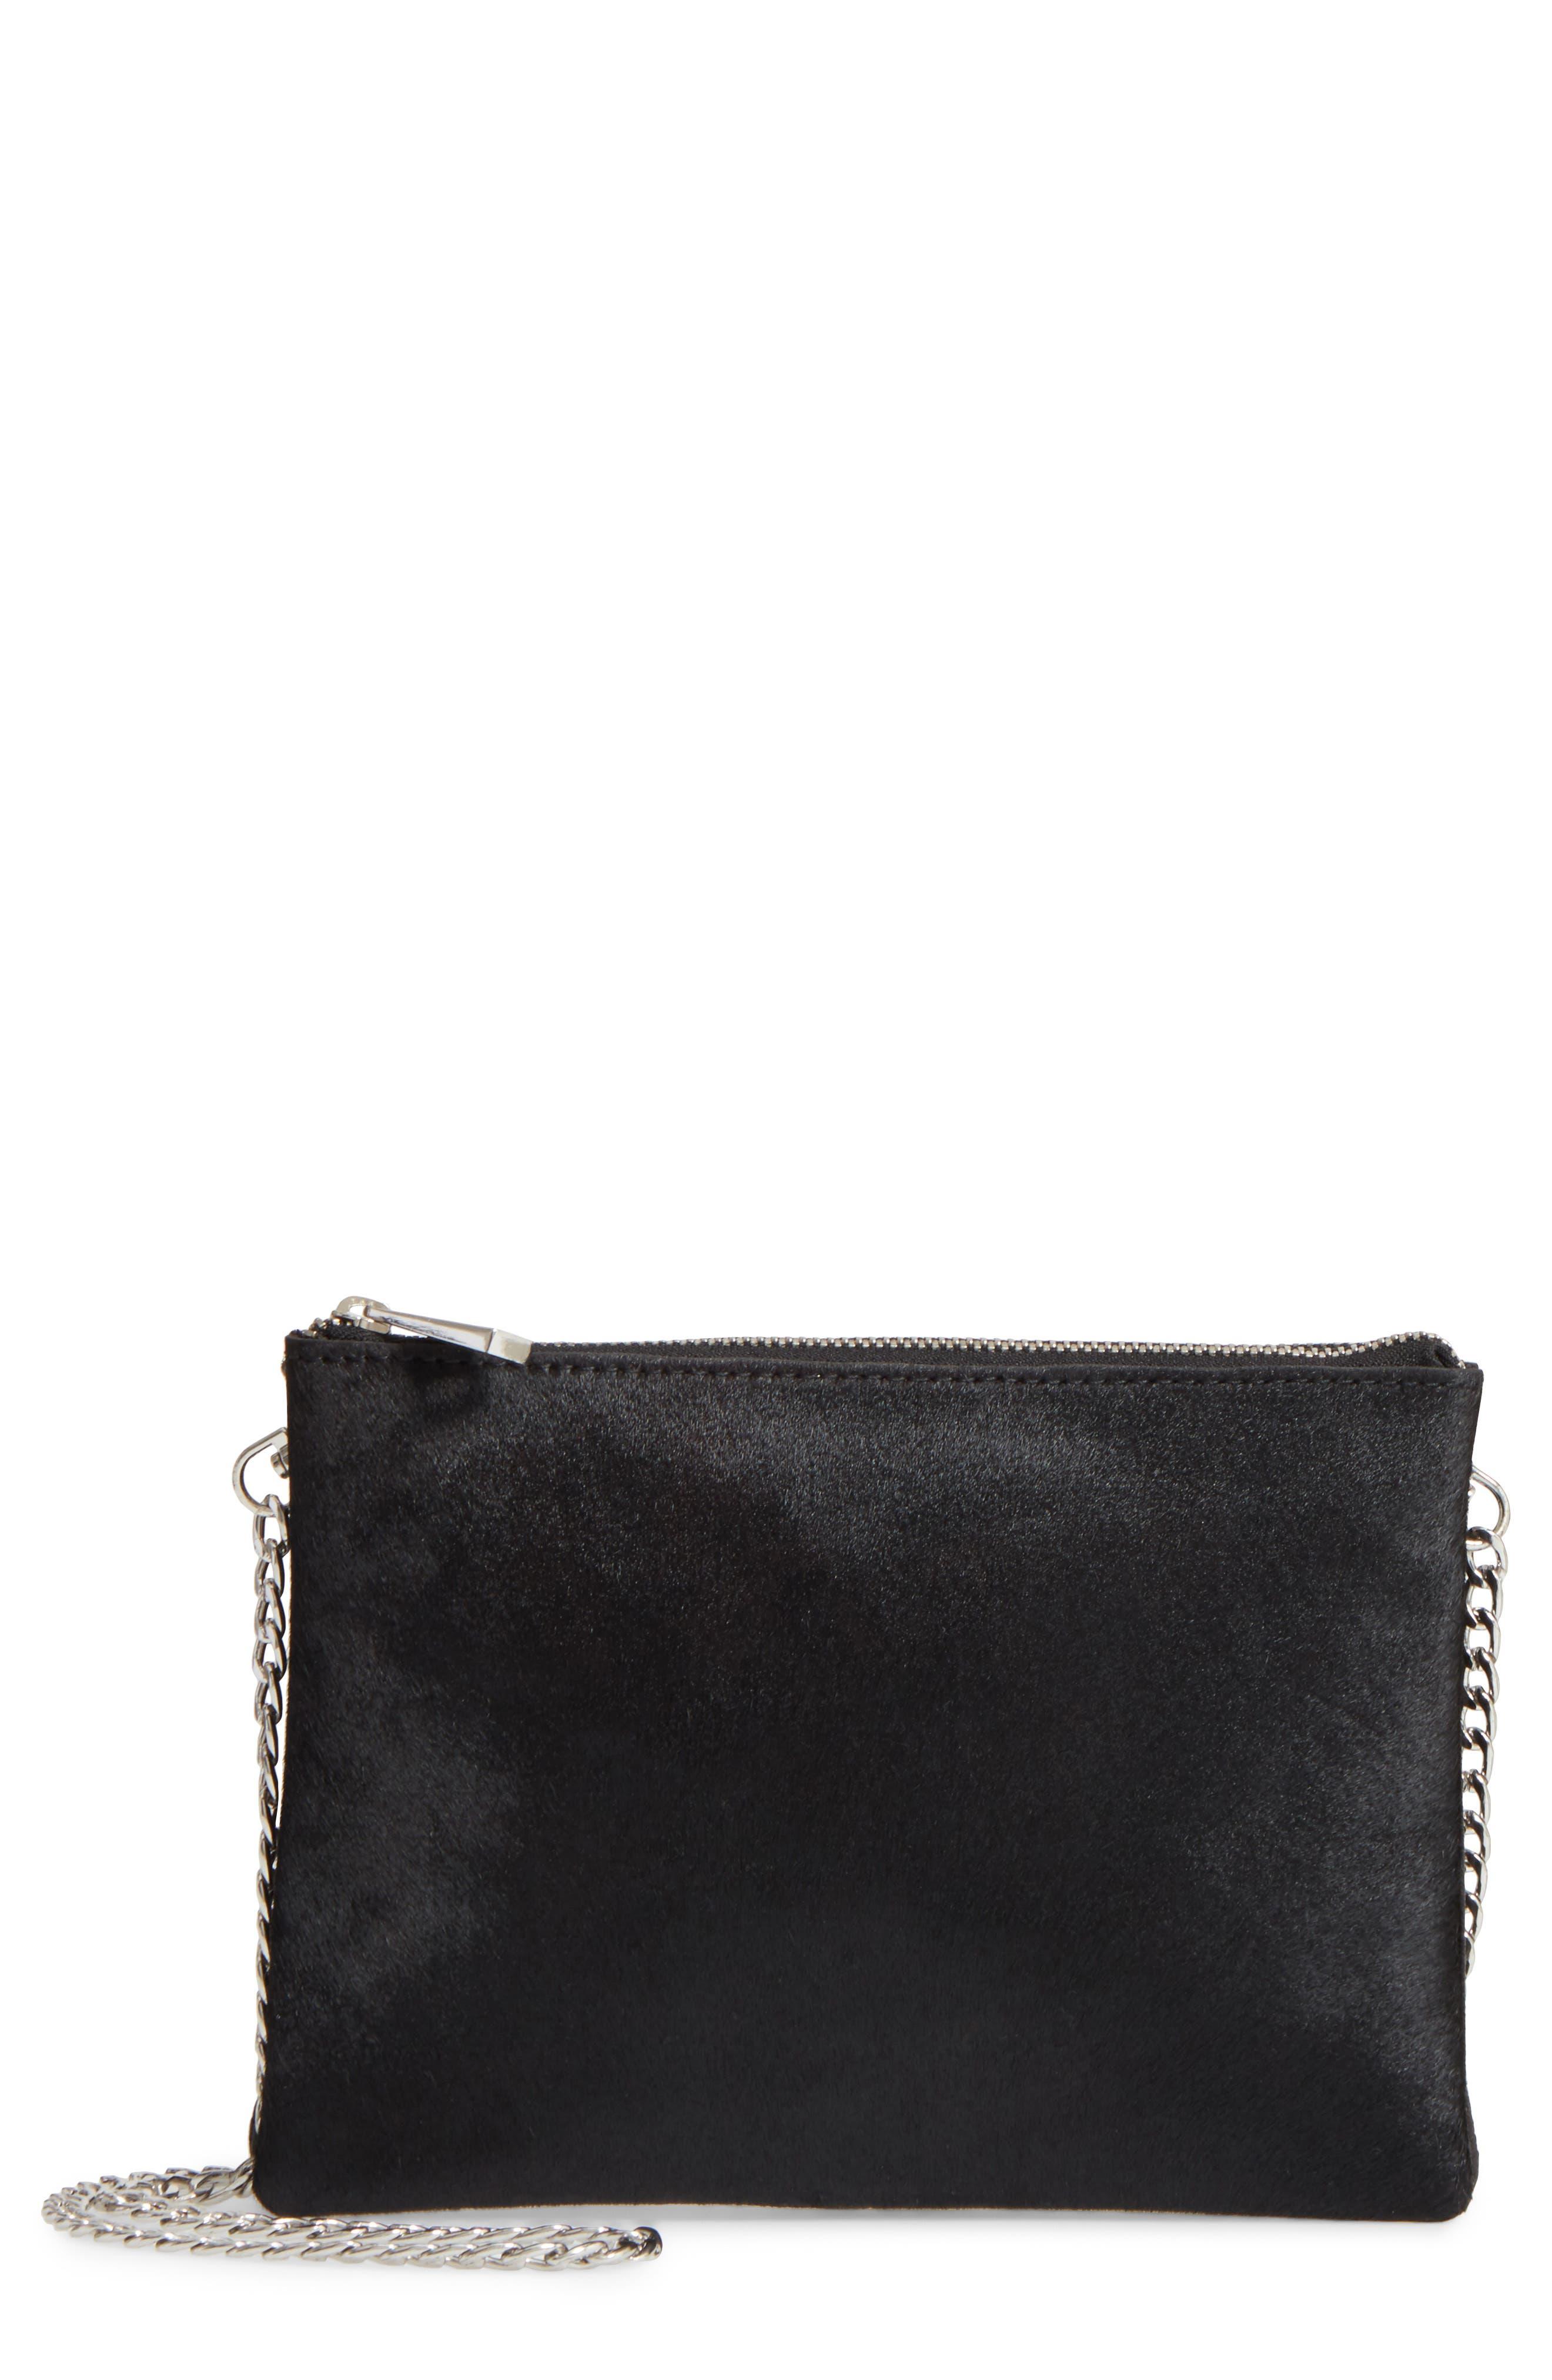 Main Image - Topshop Oakley Leather & Genuine Calf Hair Crossbody Bag